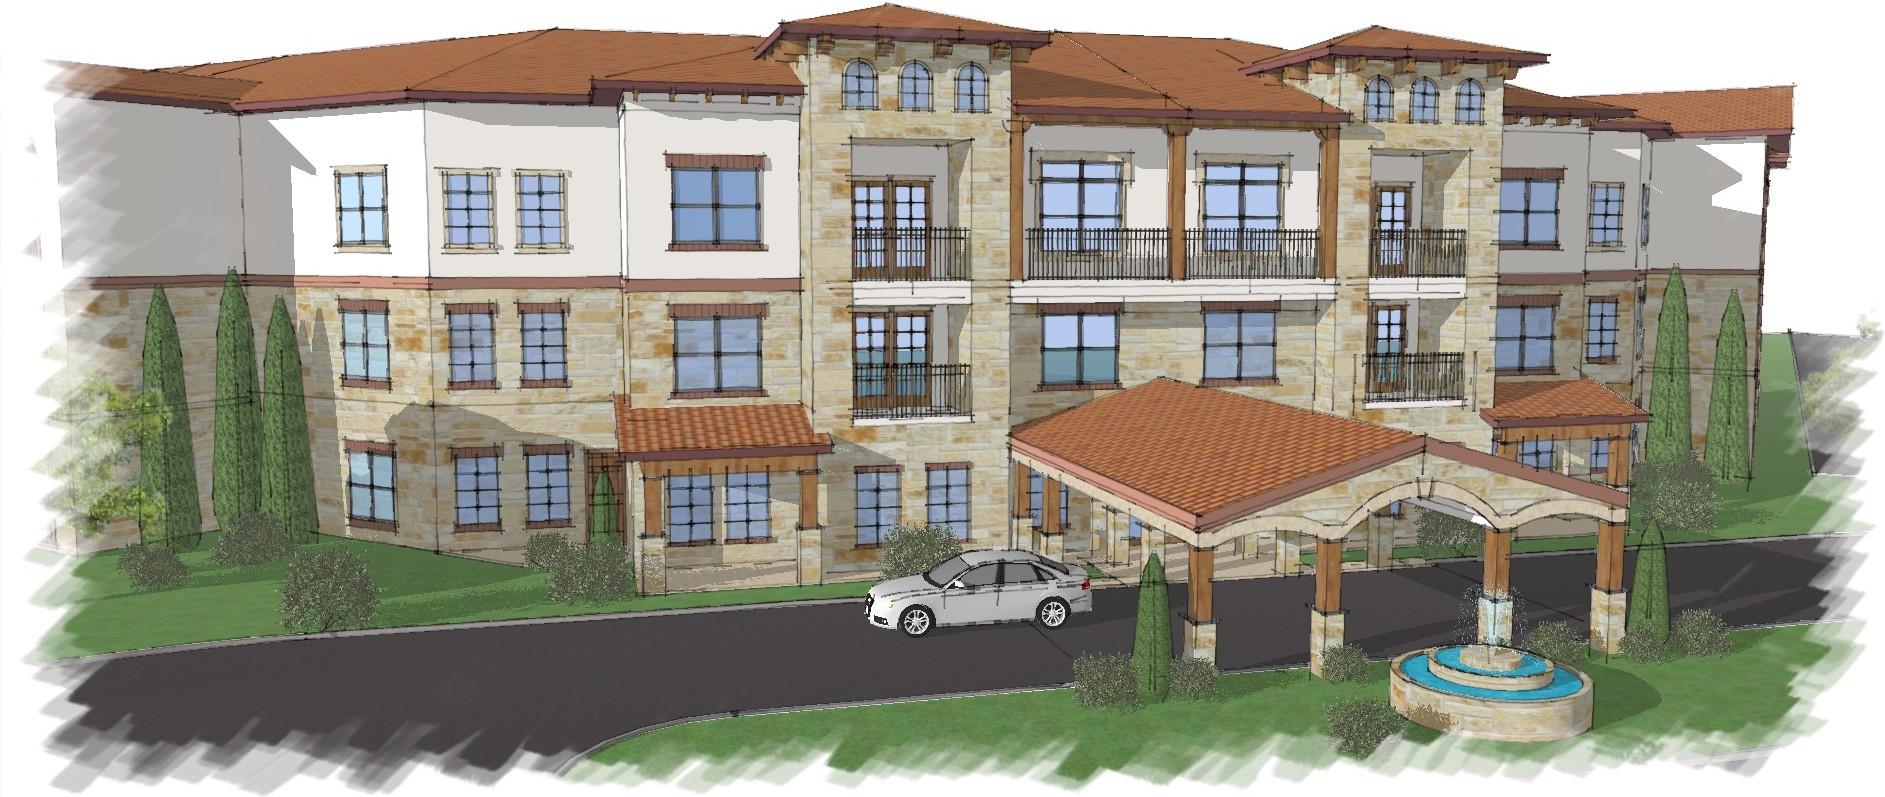 Apartments Near AC Palladium Van Alstyne Senior Living for University of Austin Students in Sherman, TX